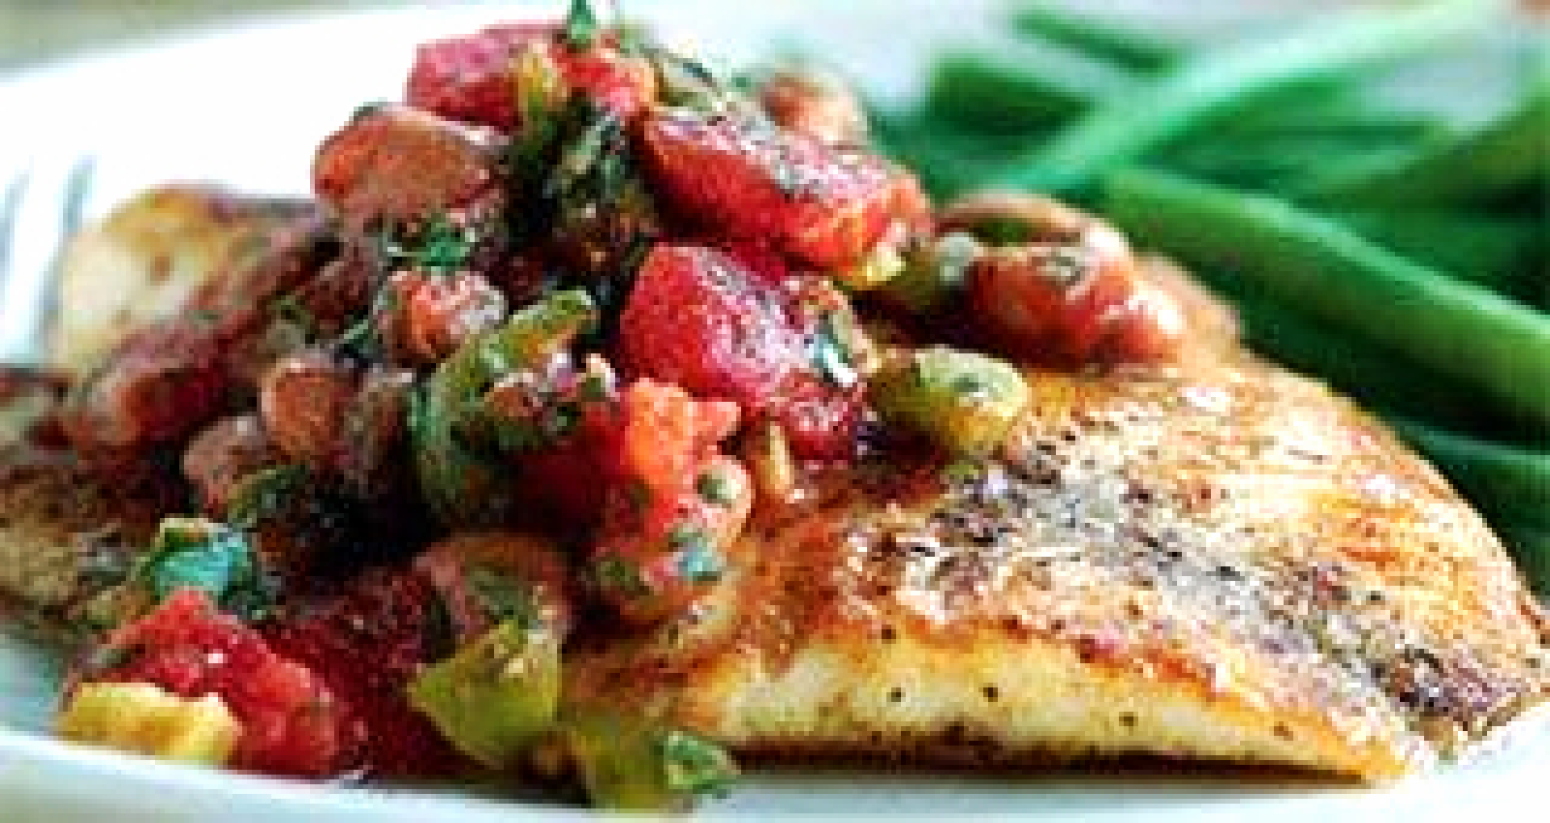 Veracruz style red snapper recipe just a pinch recipes for Fish veracruz recipe